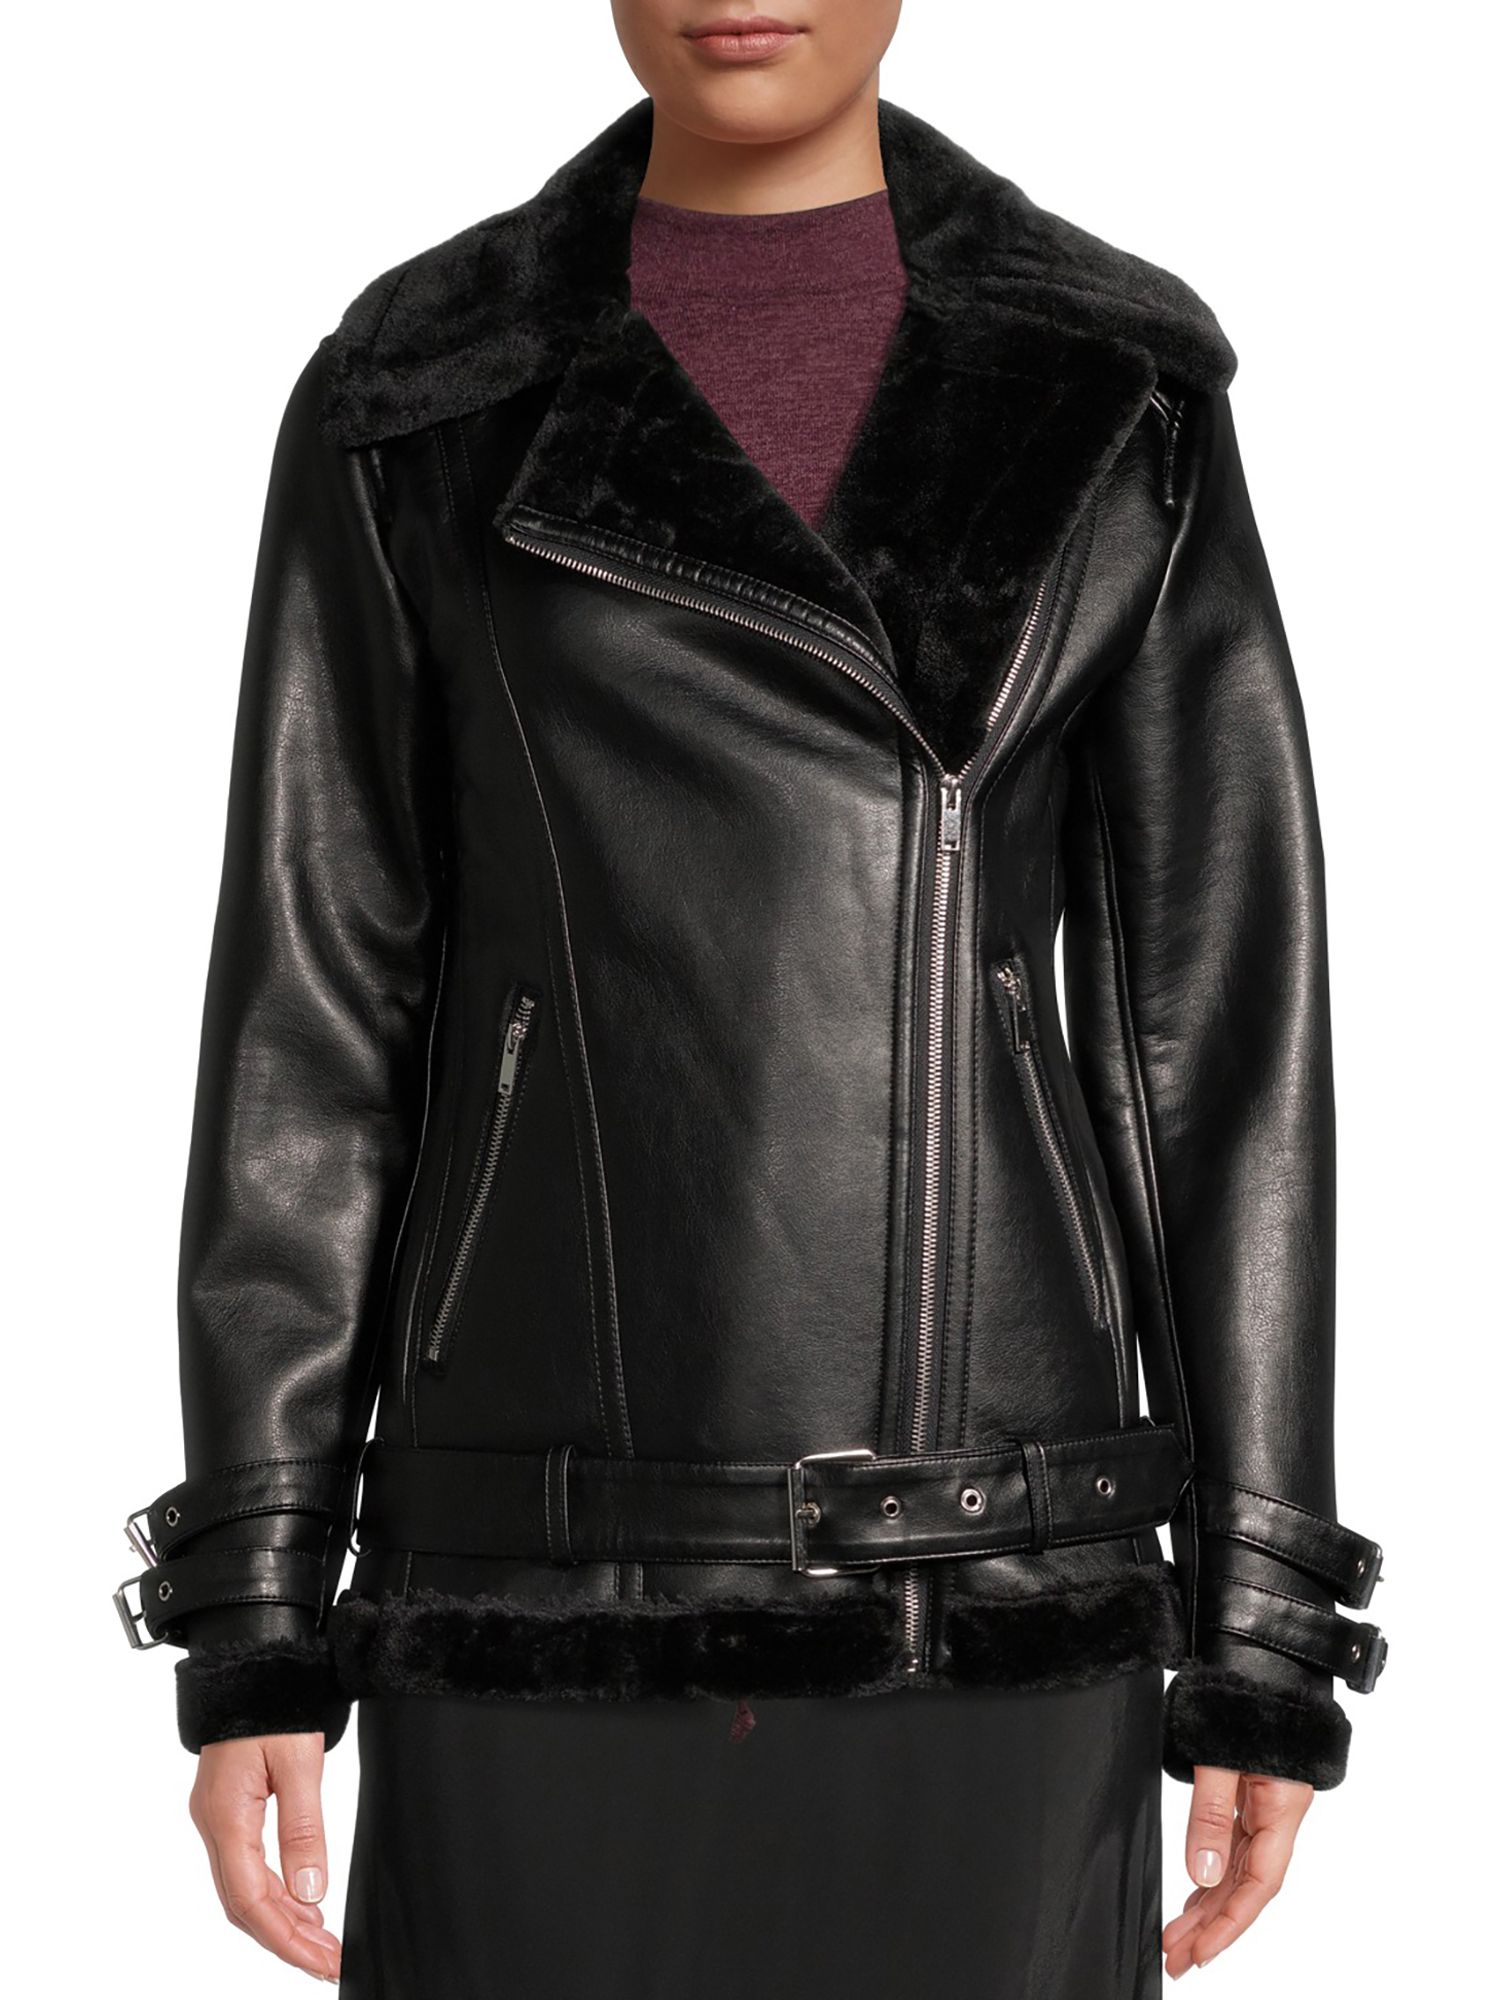 Mark Alan - Mark Alan Women's Vegan Leather Faux Fur Lined Moto Jacket - Walmart.com